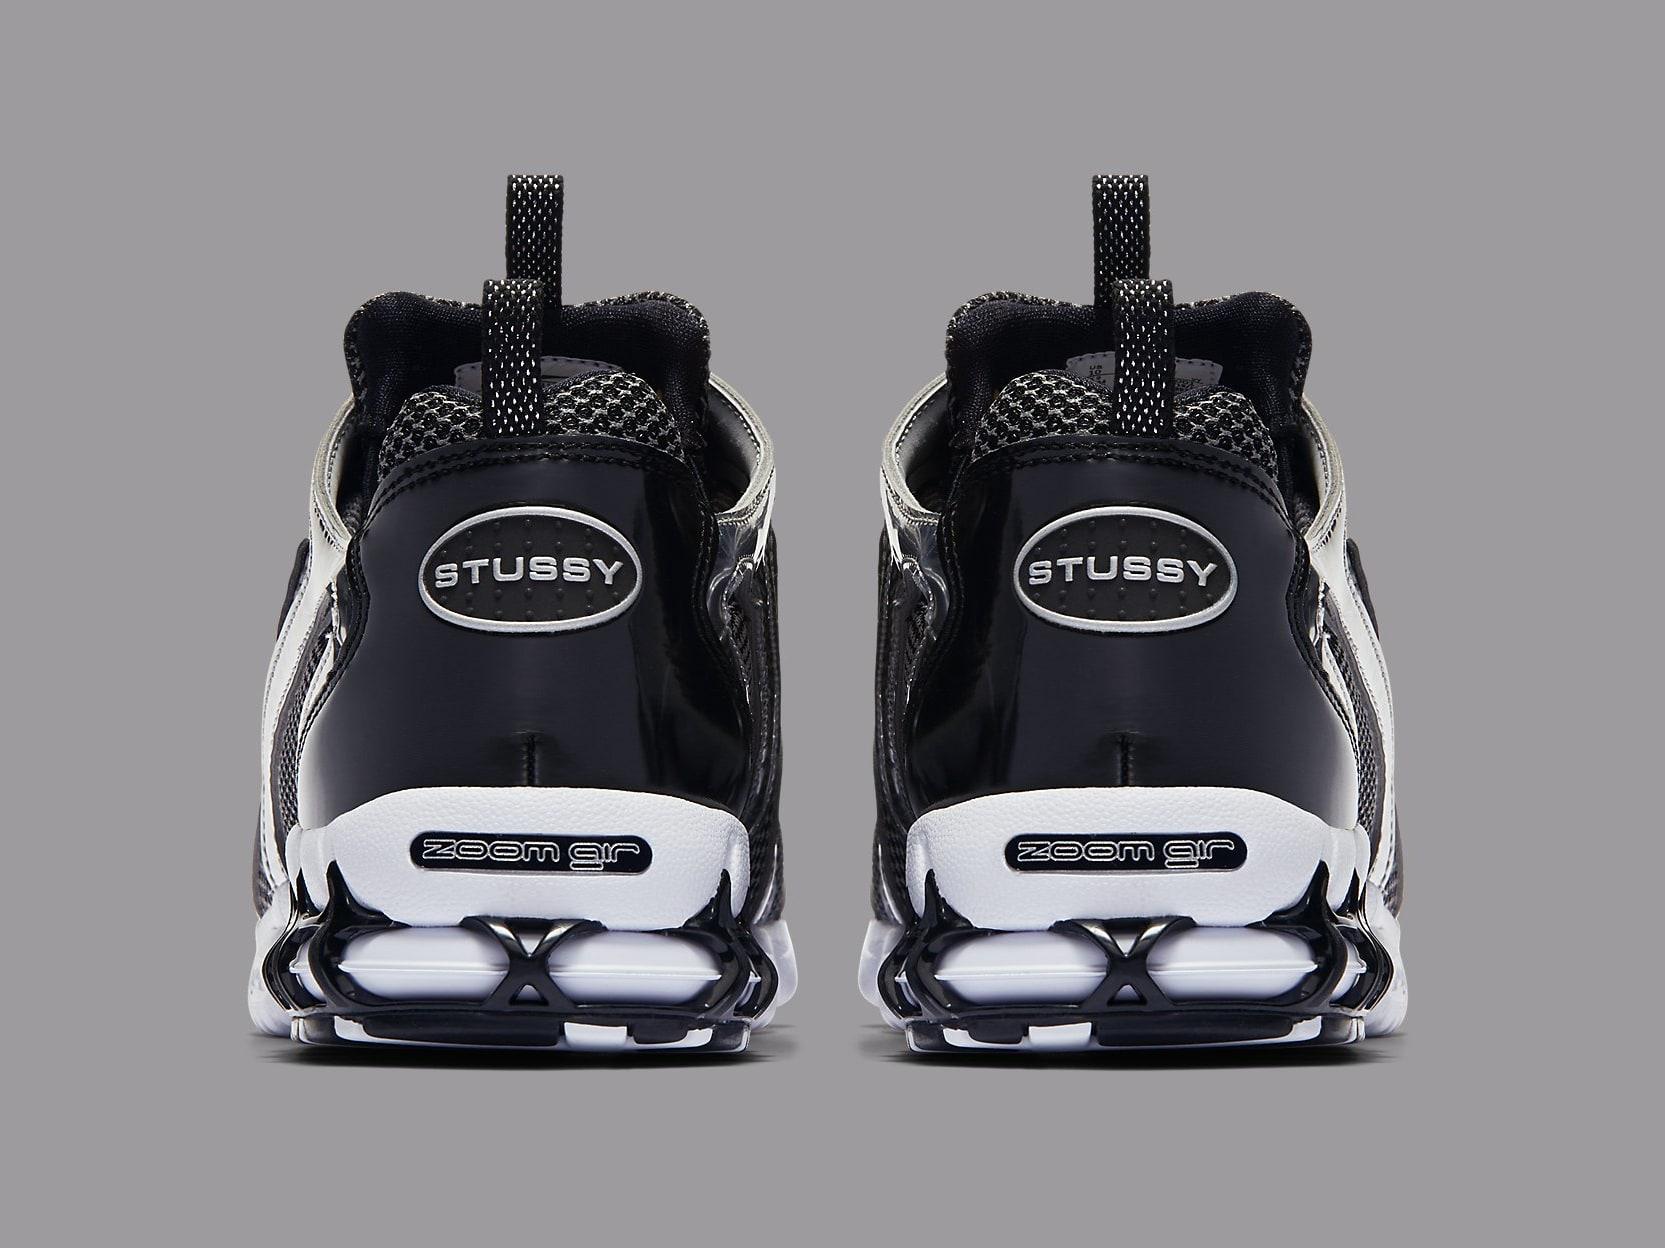 Stussy x Nike Air Zoom Spiridon Caged 2 Black Release Date CU1854-001 Heel